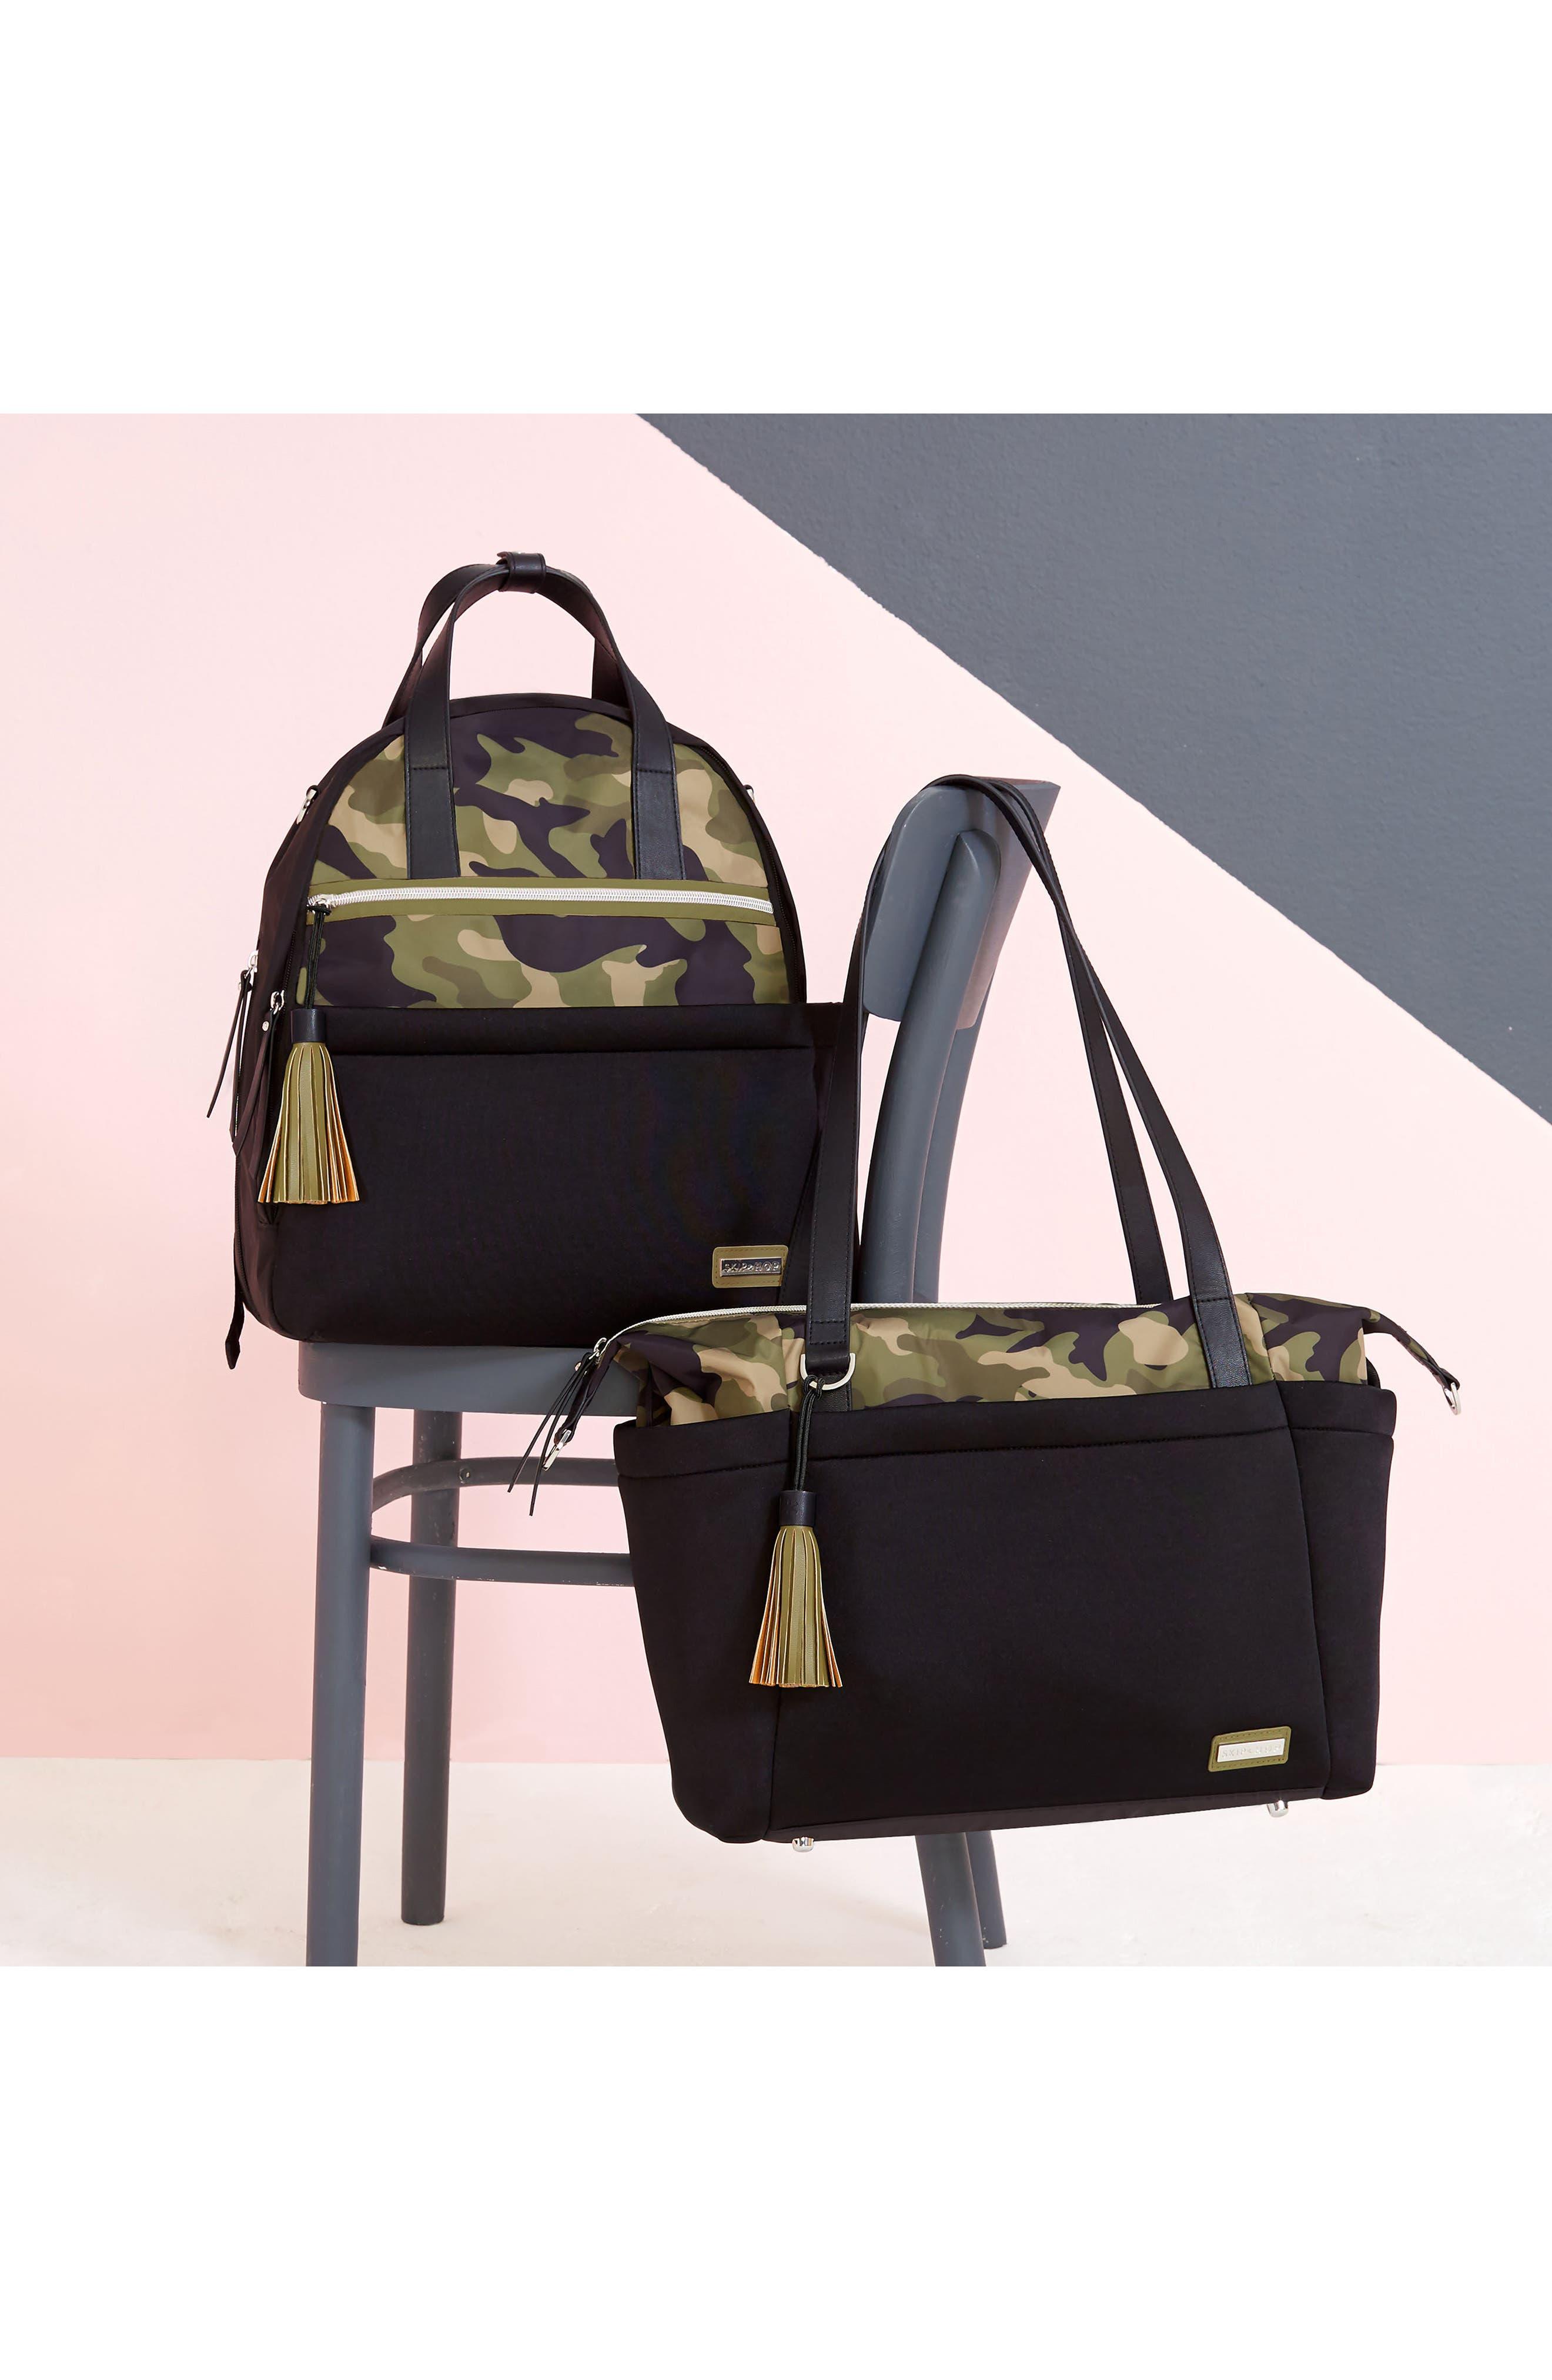 Nolita Neoprene Diaper Backpack,                             Alternate thumbnail 4, color,                             BLACK/ DARK CAMO